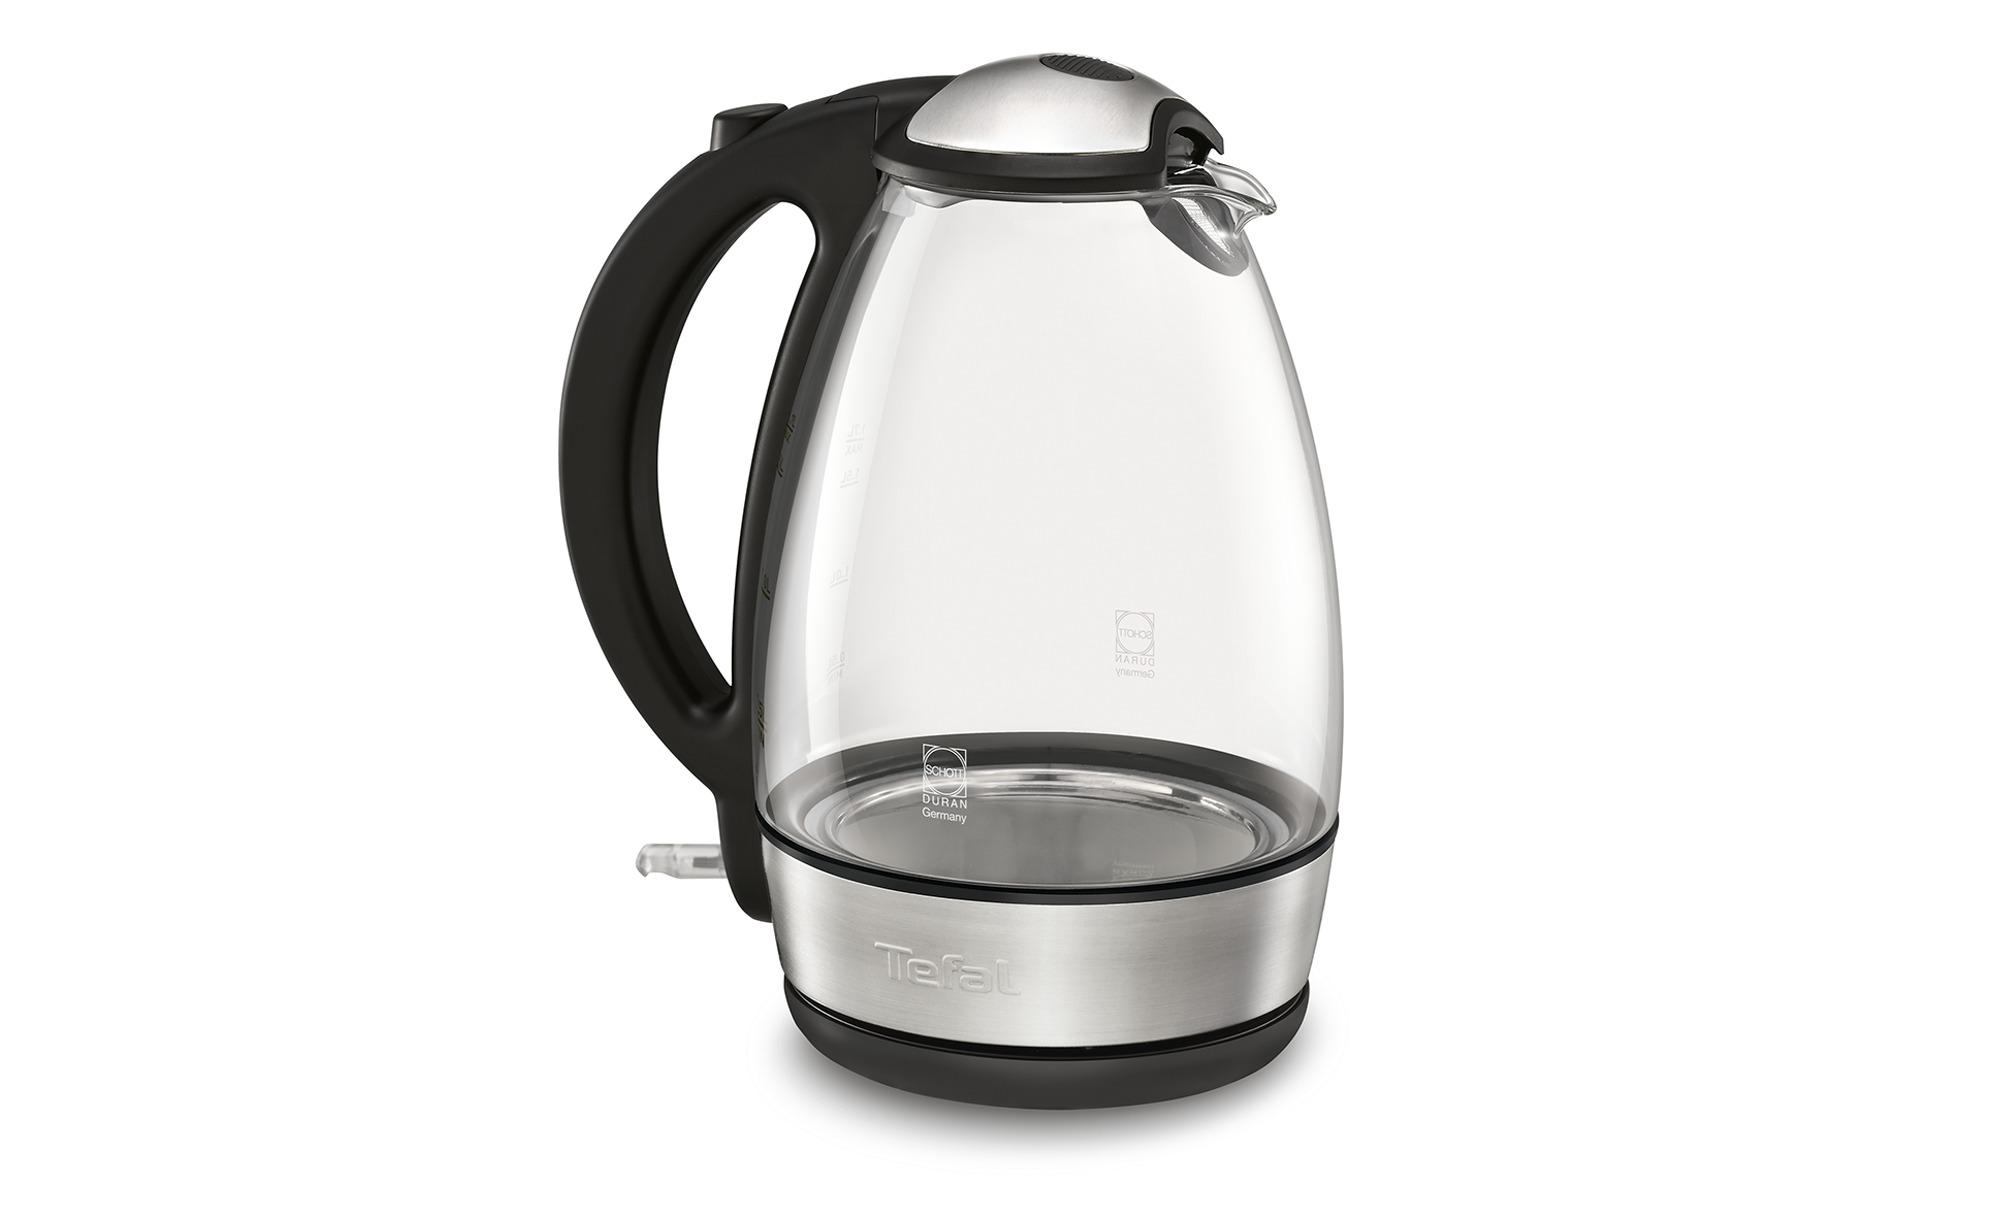 Tefal Wasserkocher  KI 7208 - Kunststoff, Glas , Edelstahl - 24 cm - 17 cm - 26 cm - Elektrokleingeräte > Wasserkocher - Möbel Kraft